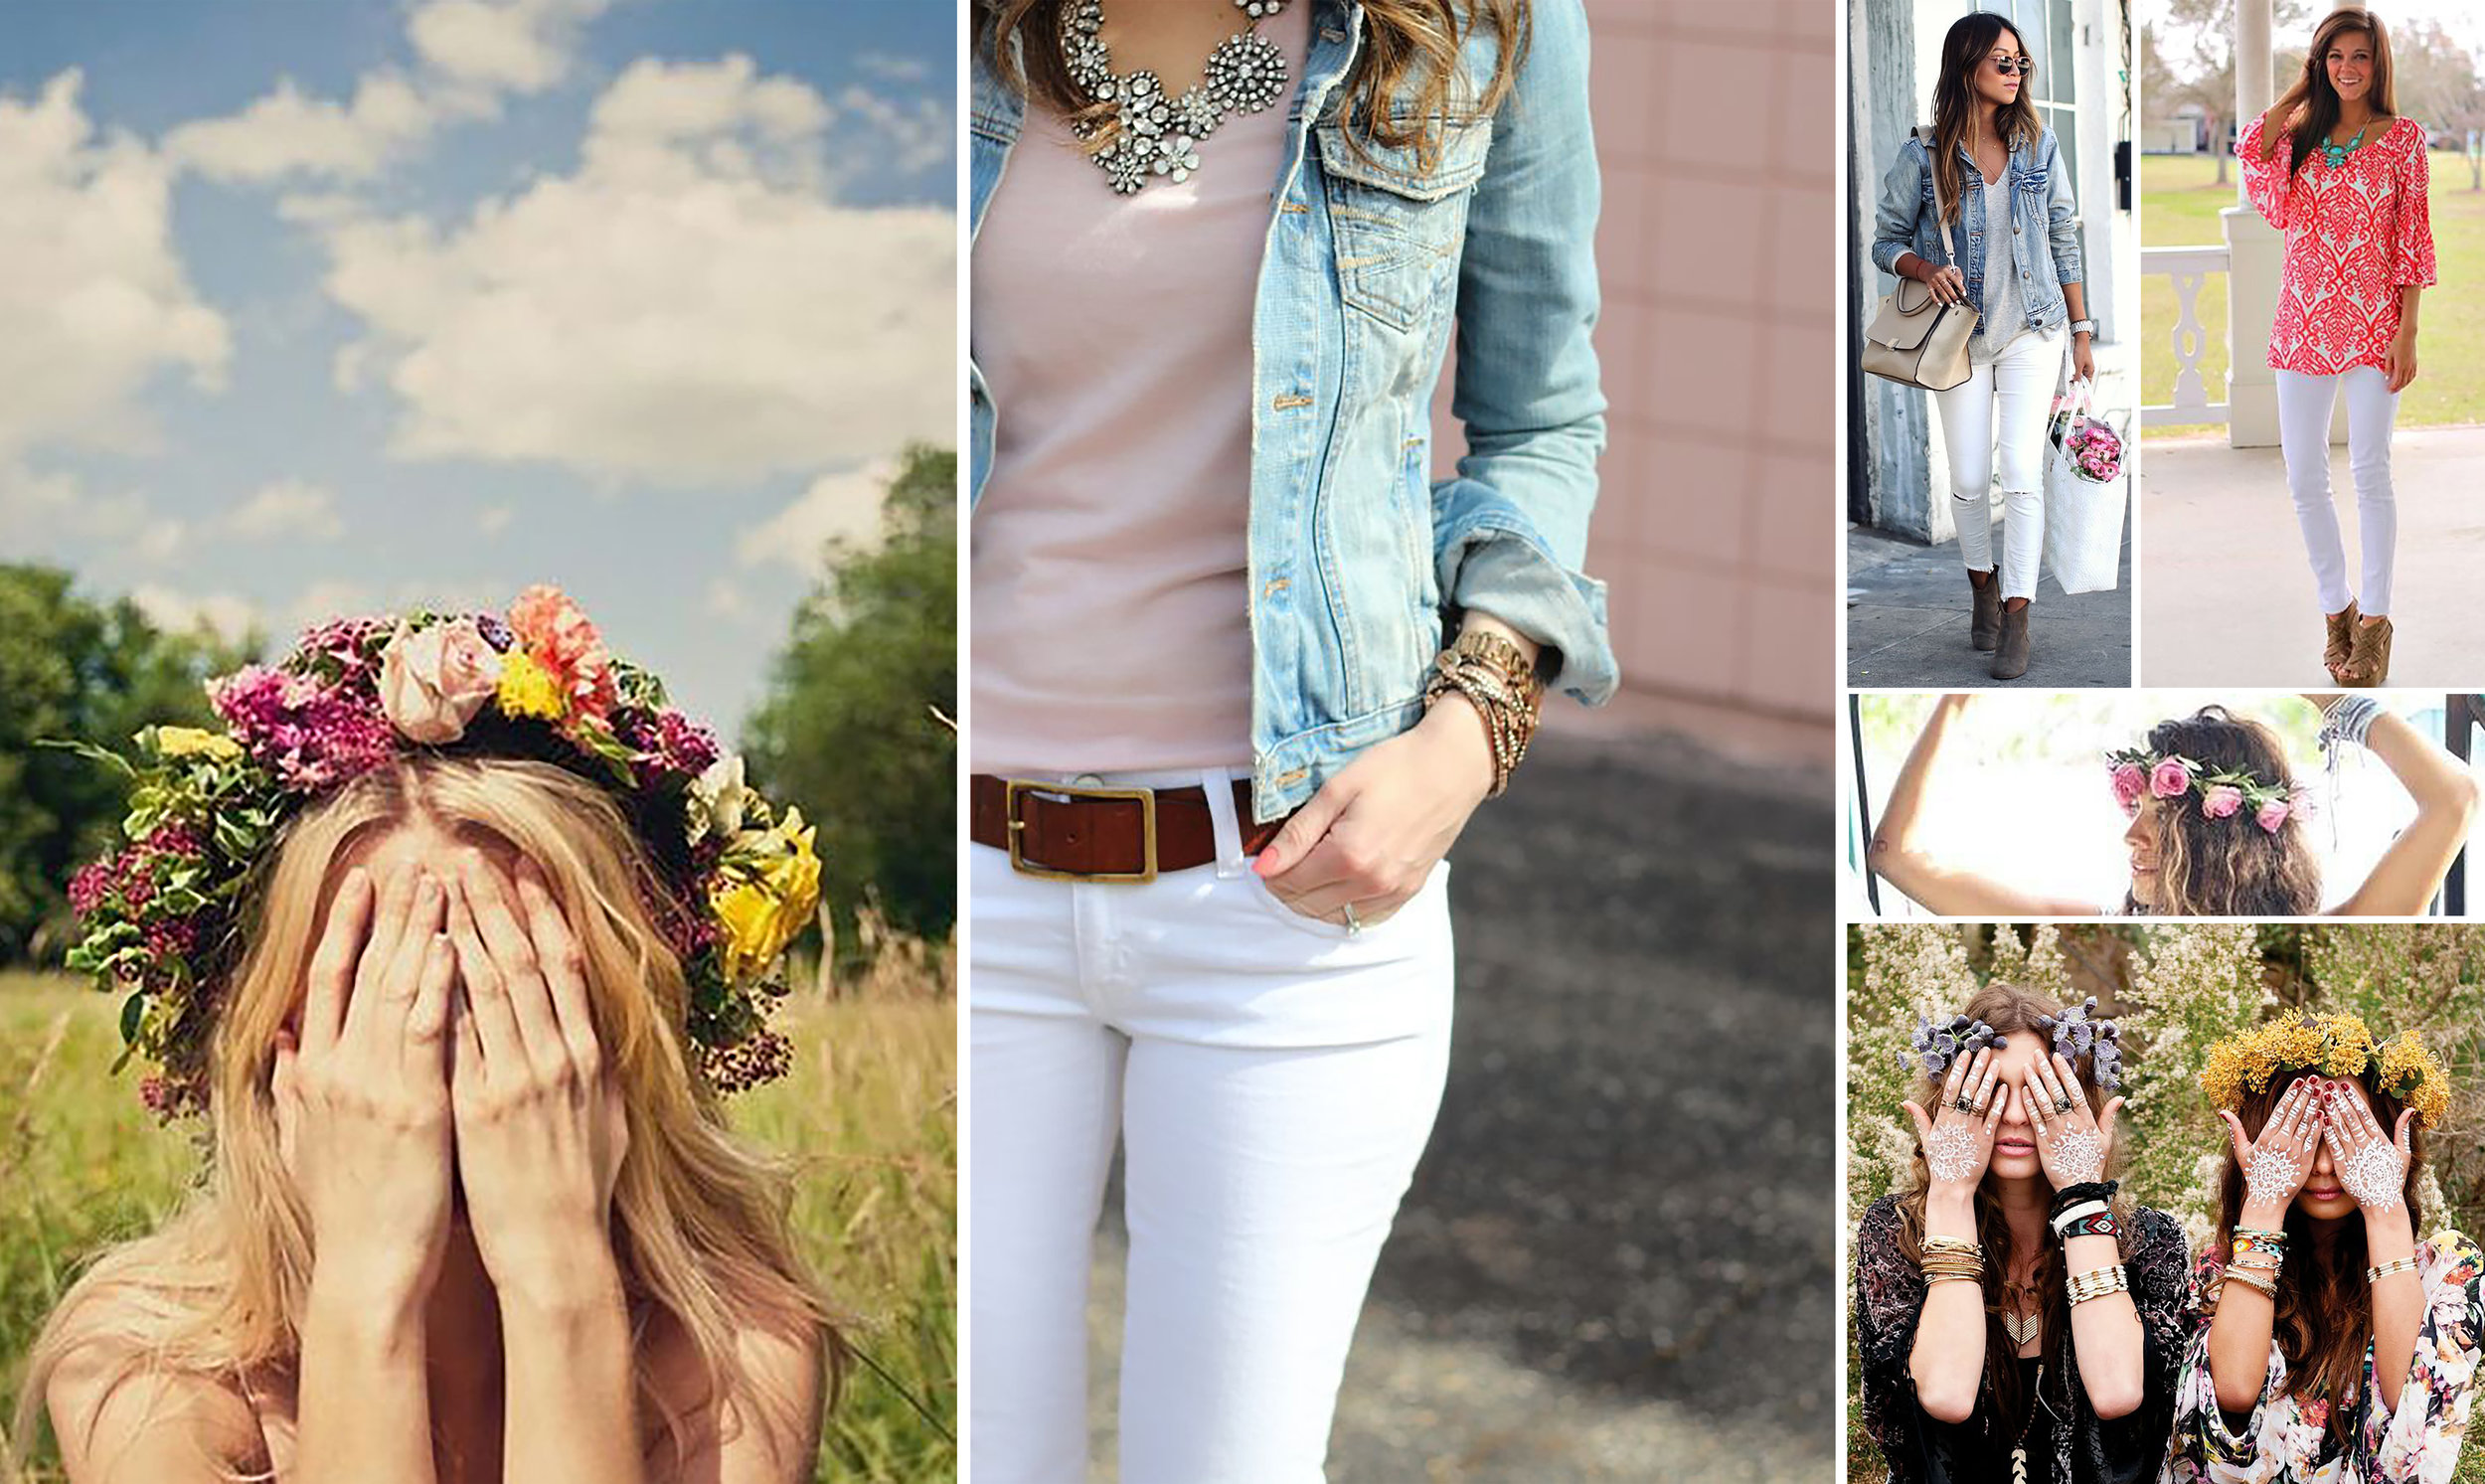 flower-crowns-white-pants.jpg